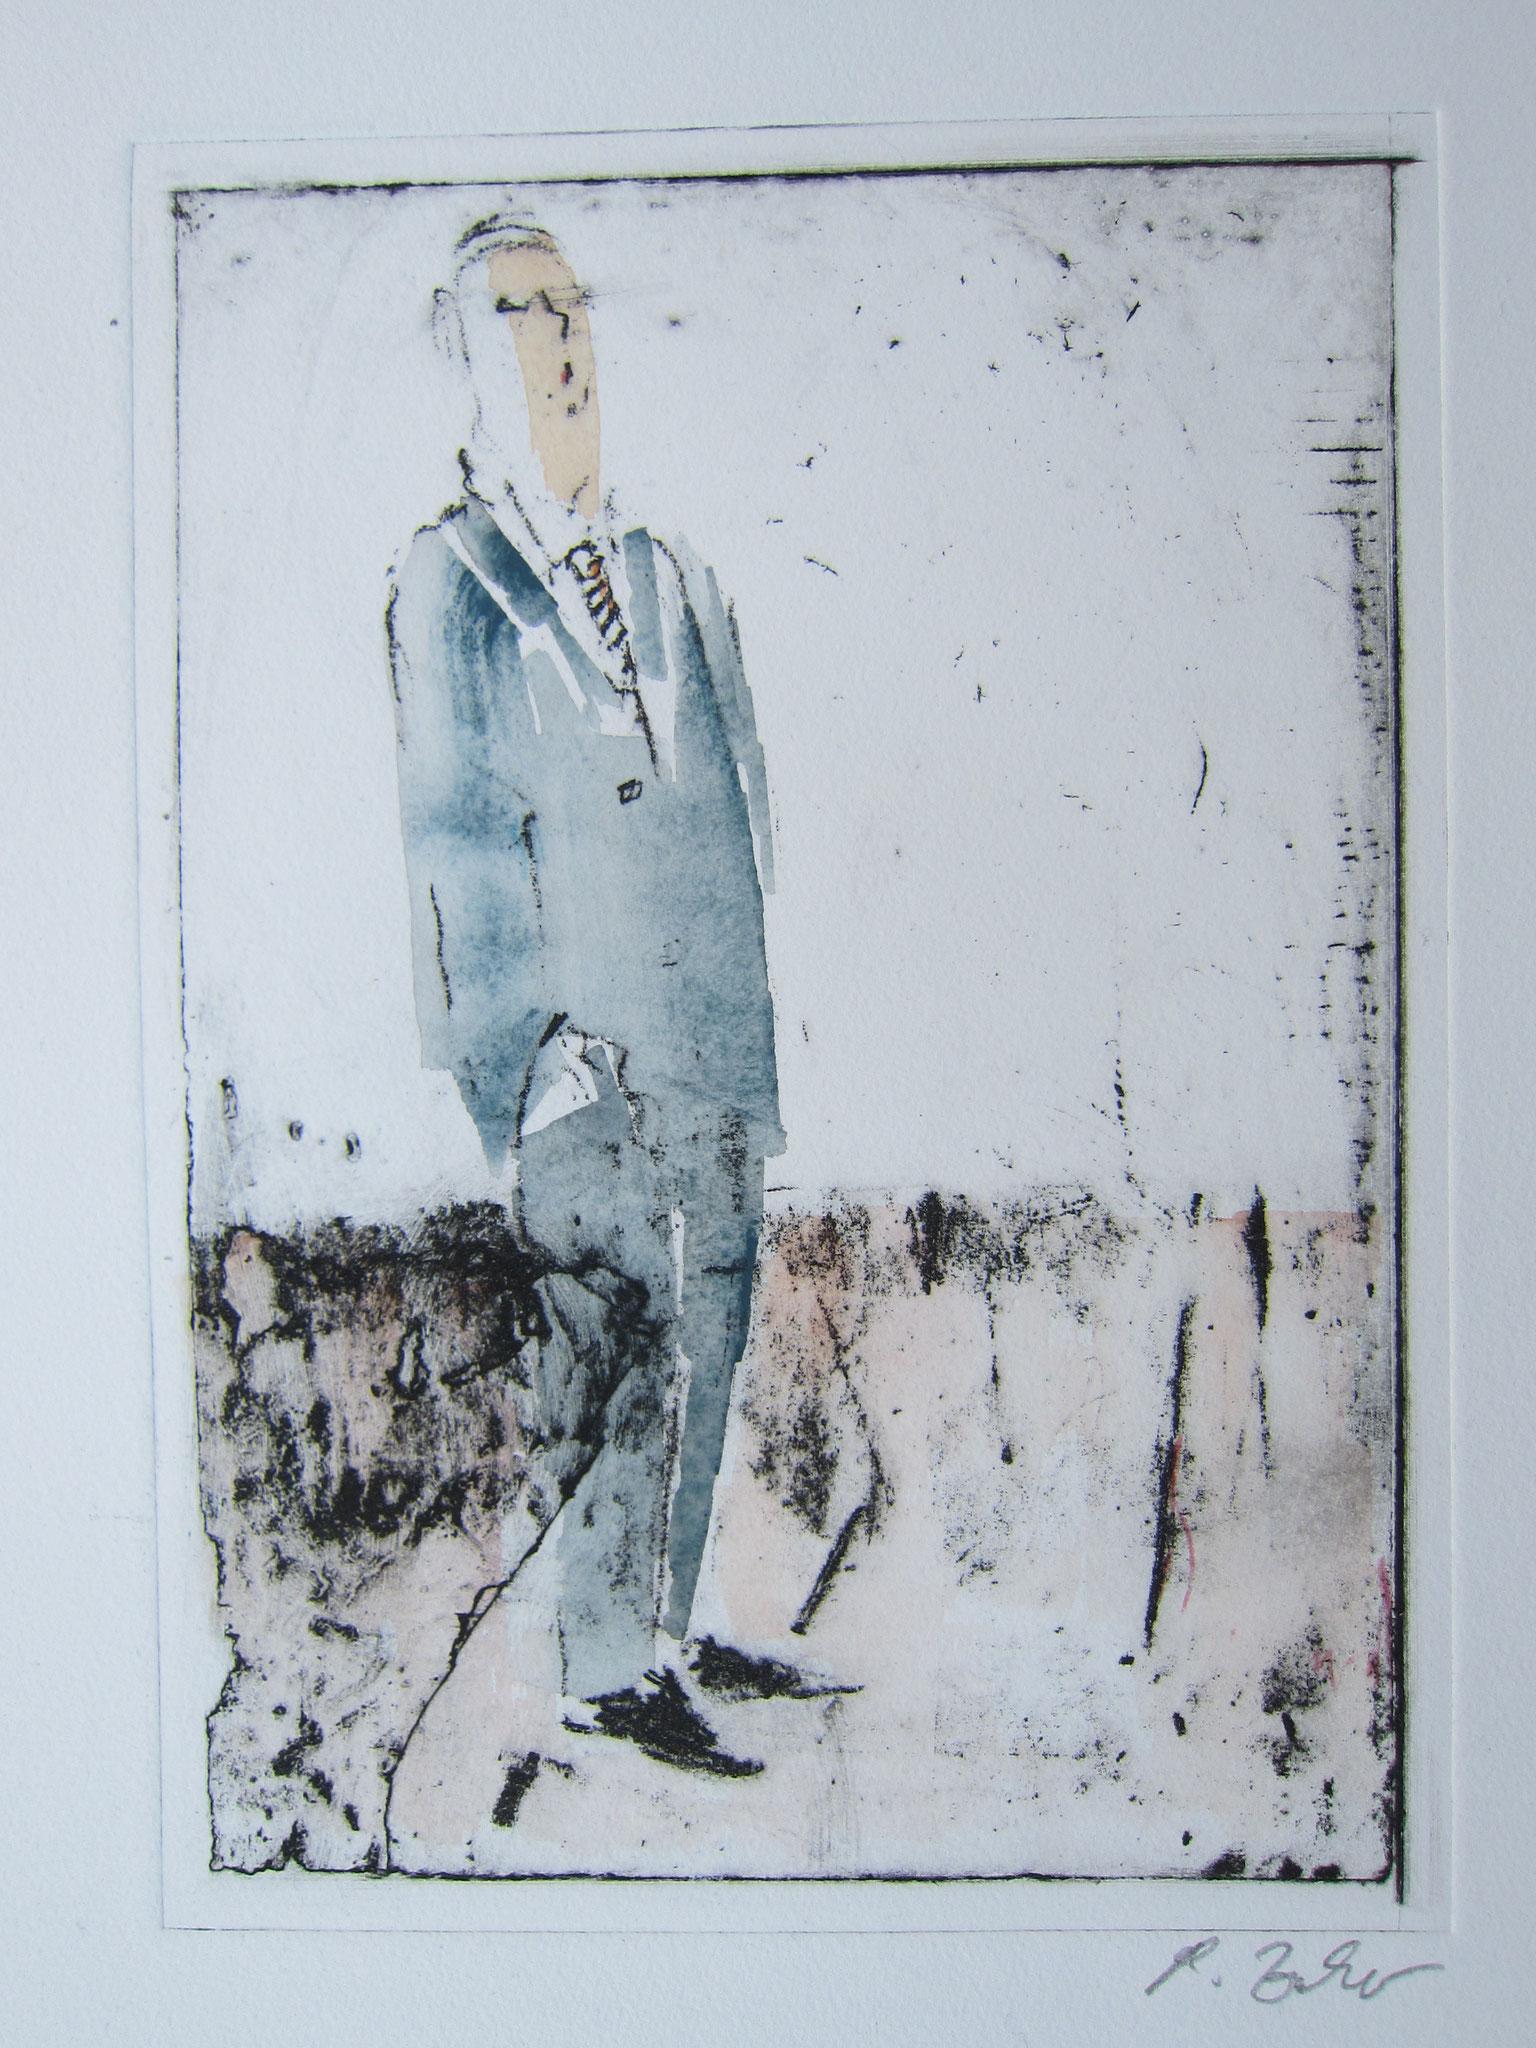 Poised, Intagliotypie, 70 x 50 cm